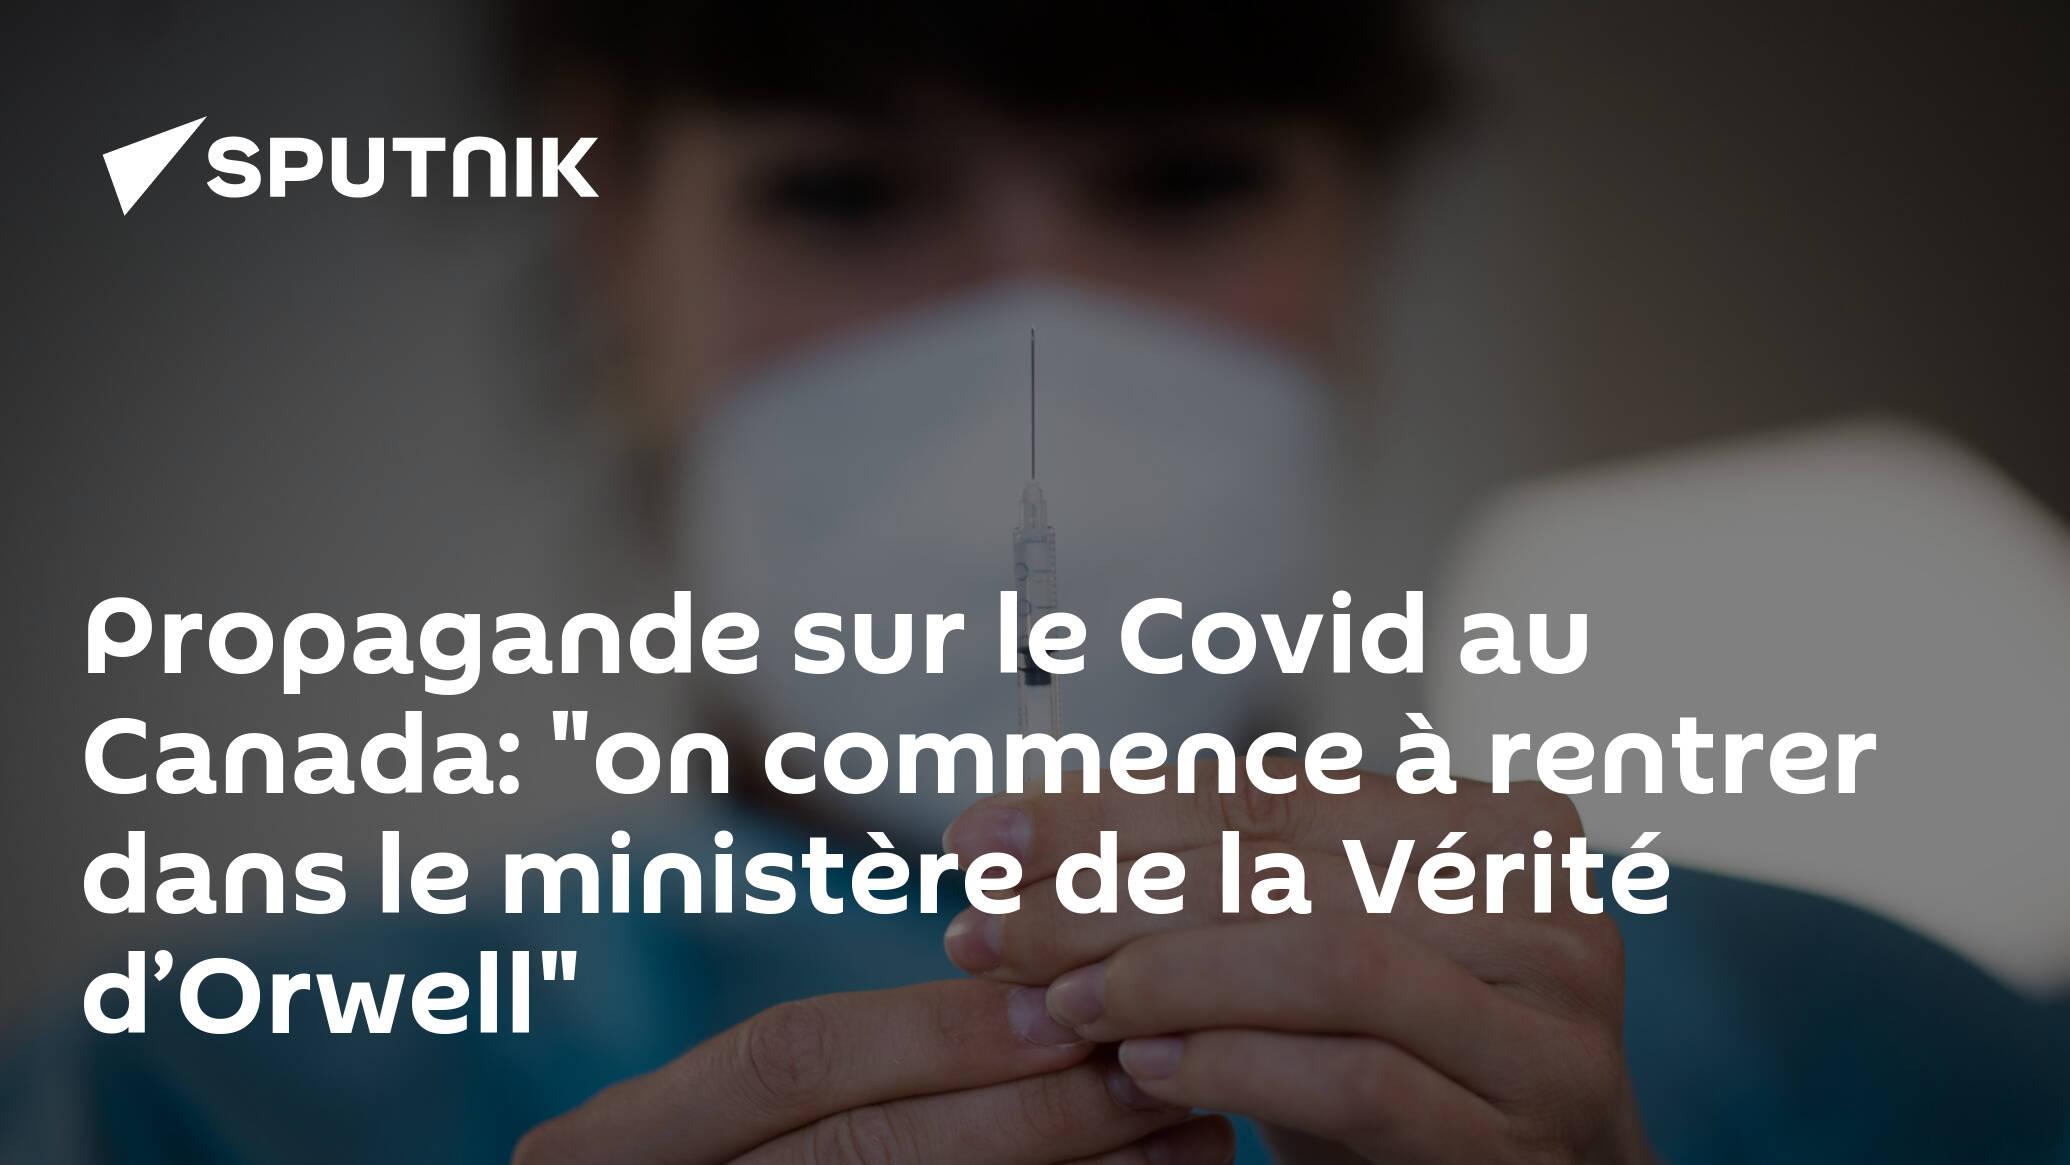 Image Propagande sur le Covid au Canada: